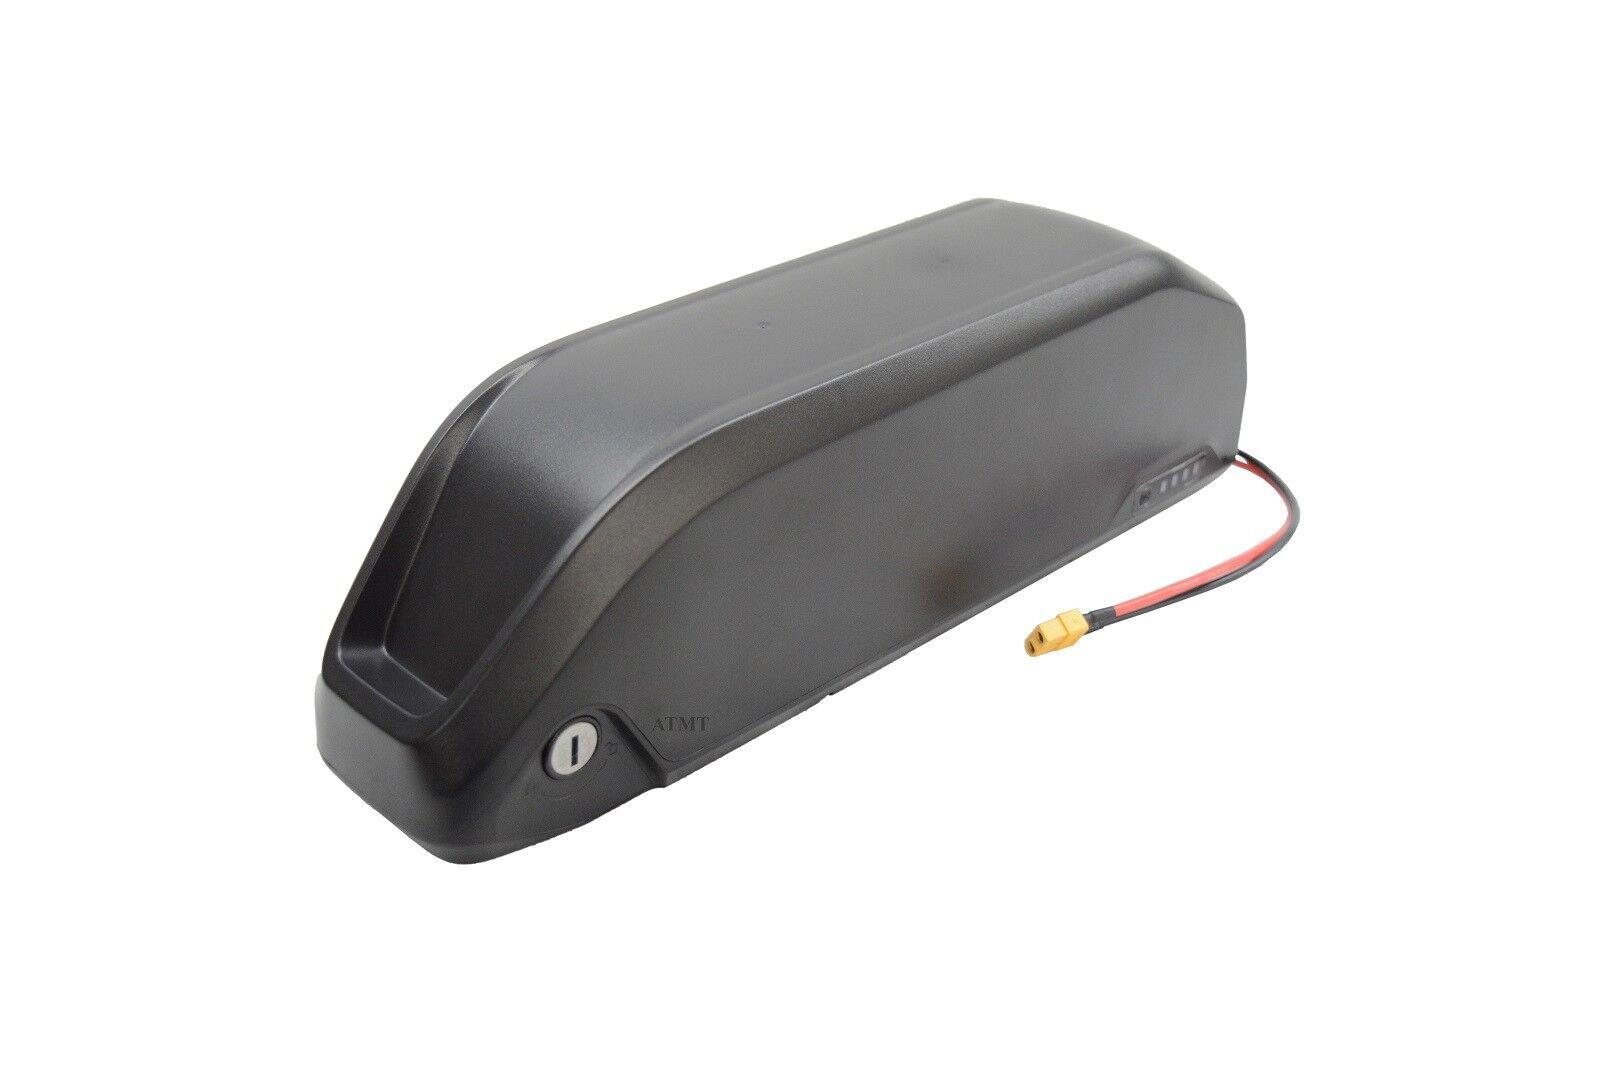 E-Fahrrad Battery 36V 18.2 AH Pedelec polytype Li-ion Frame Battery Bottle Battery